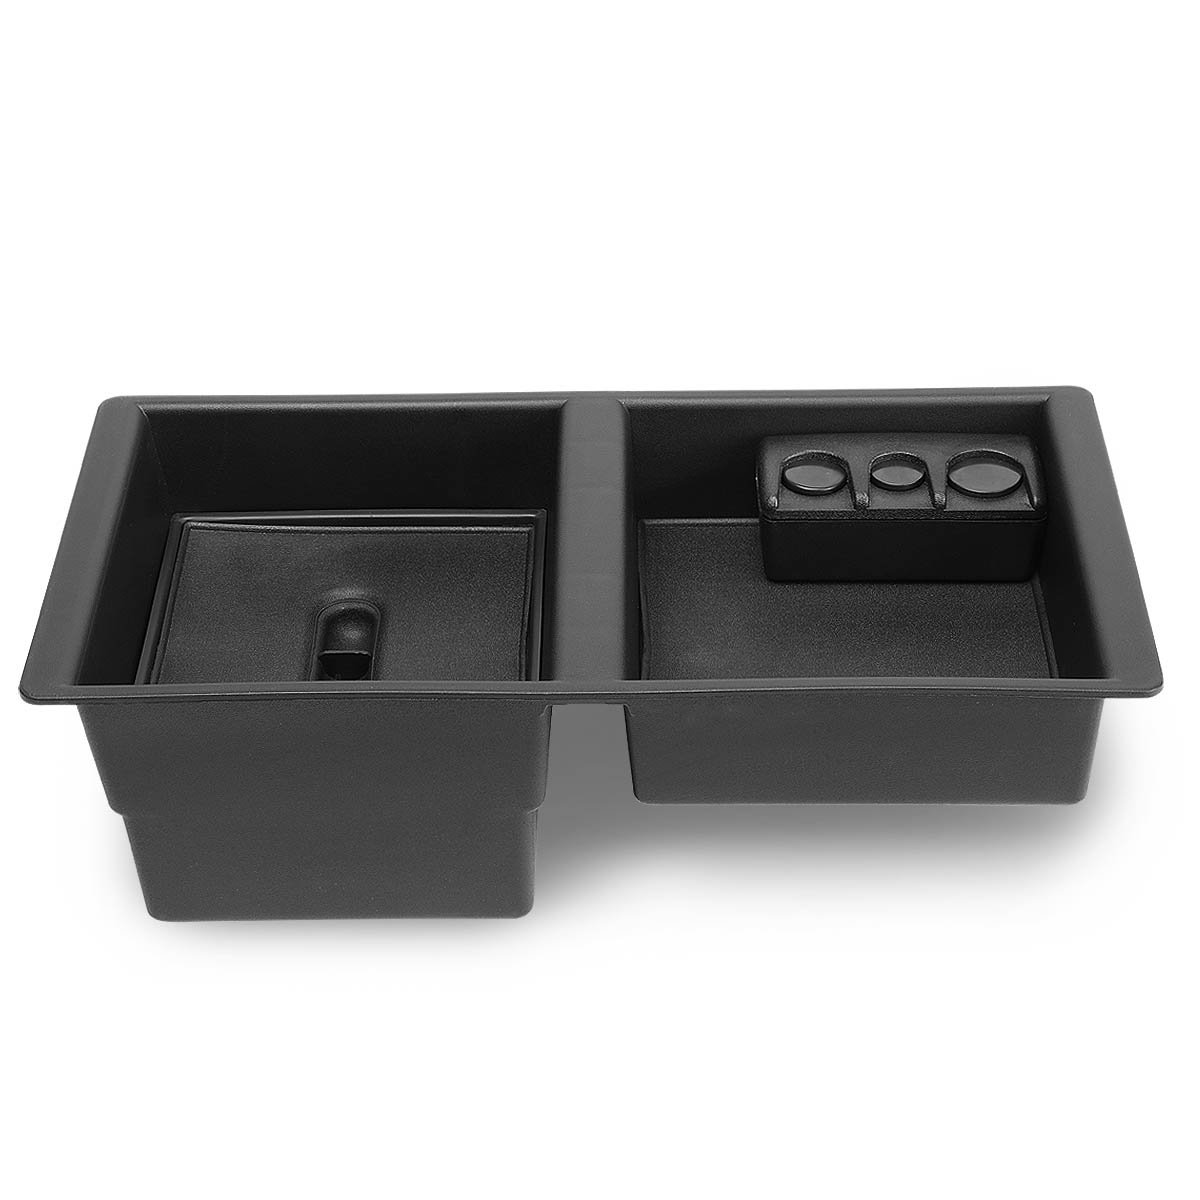 for 14-18 Silverado//Sierra DNA MOTORING Cecon-GM Center Console Organizer Insert Tray